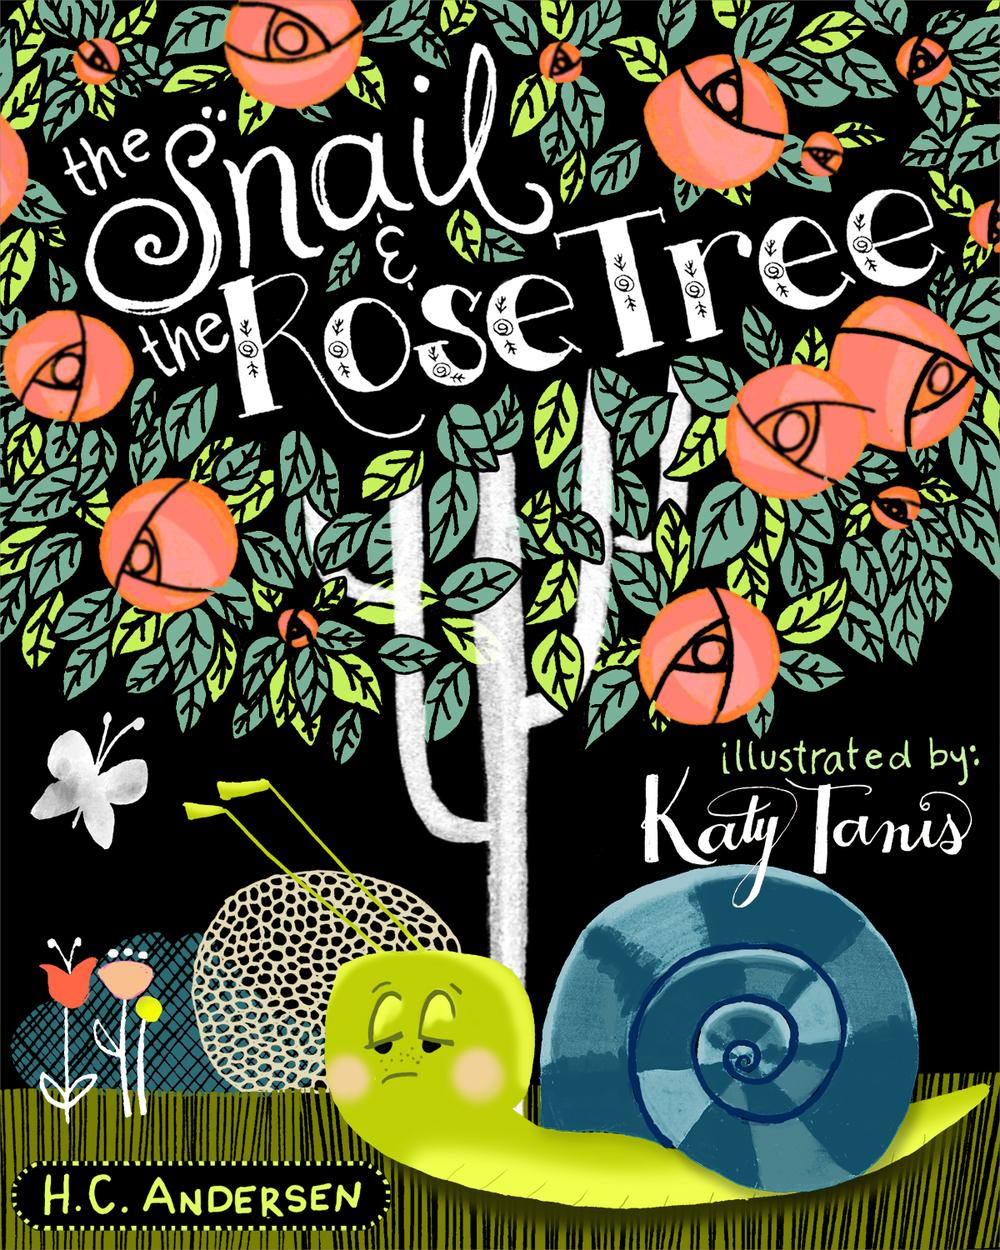 Snail-and-the-rose-tree-katy-tanis.jpg